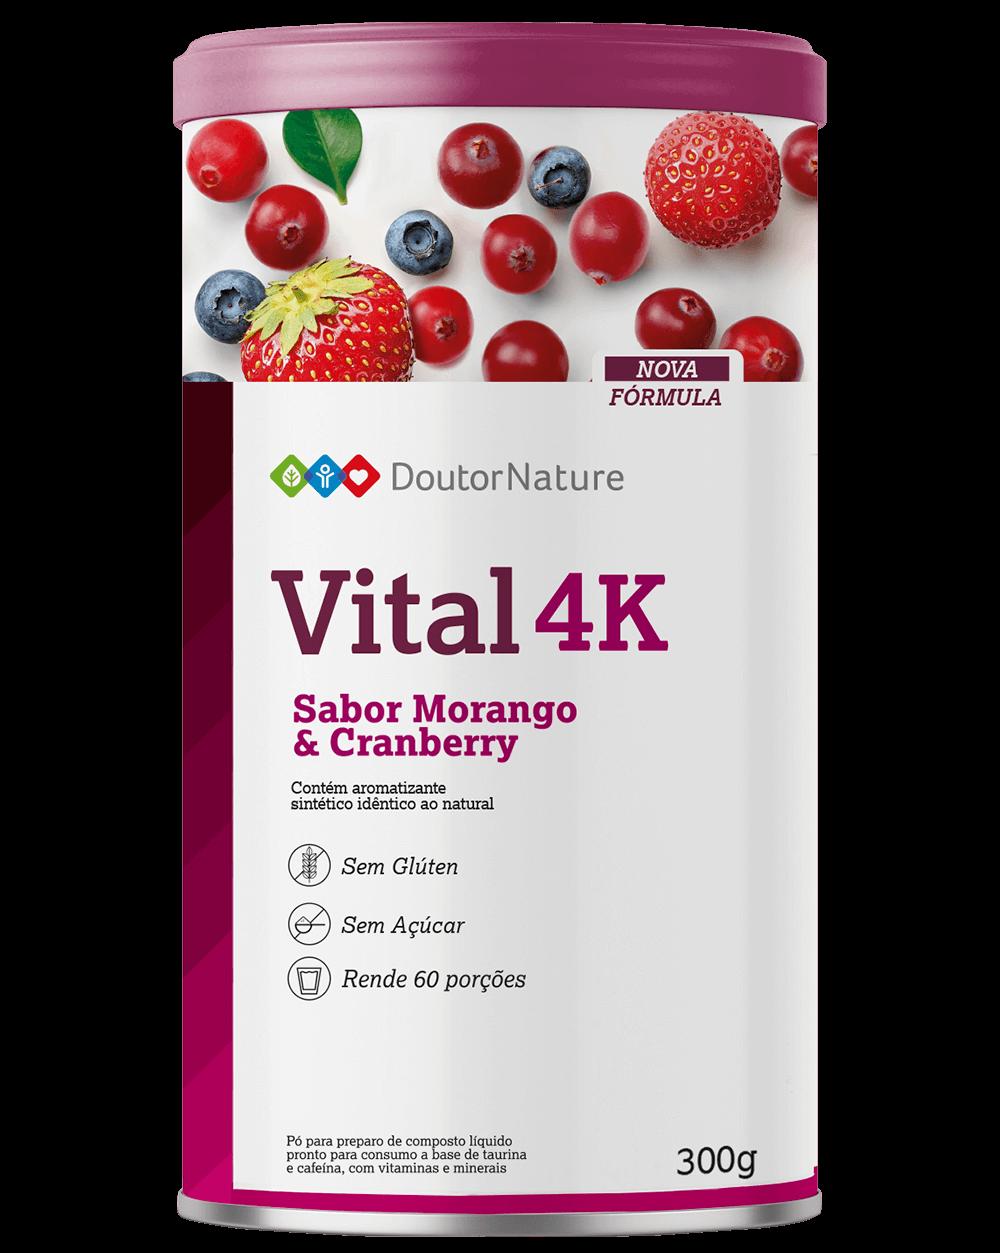 vital 4k embalagem